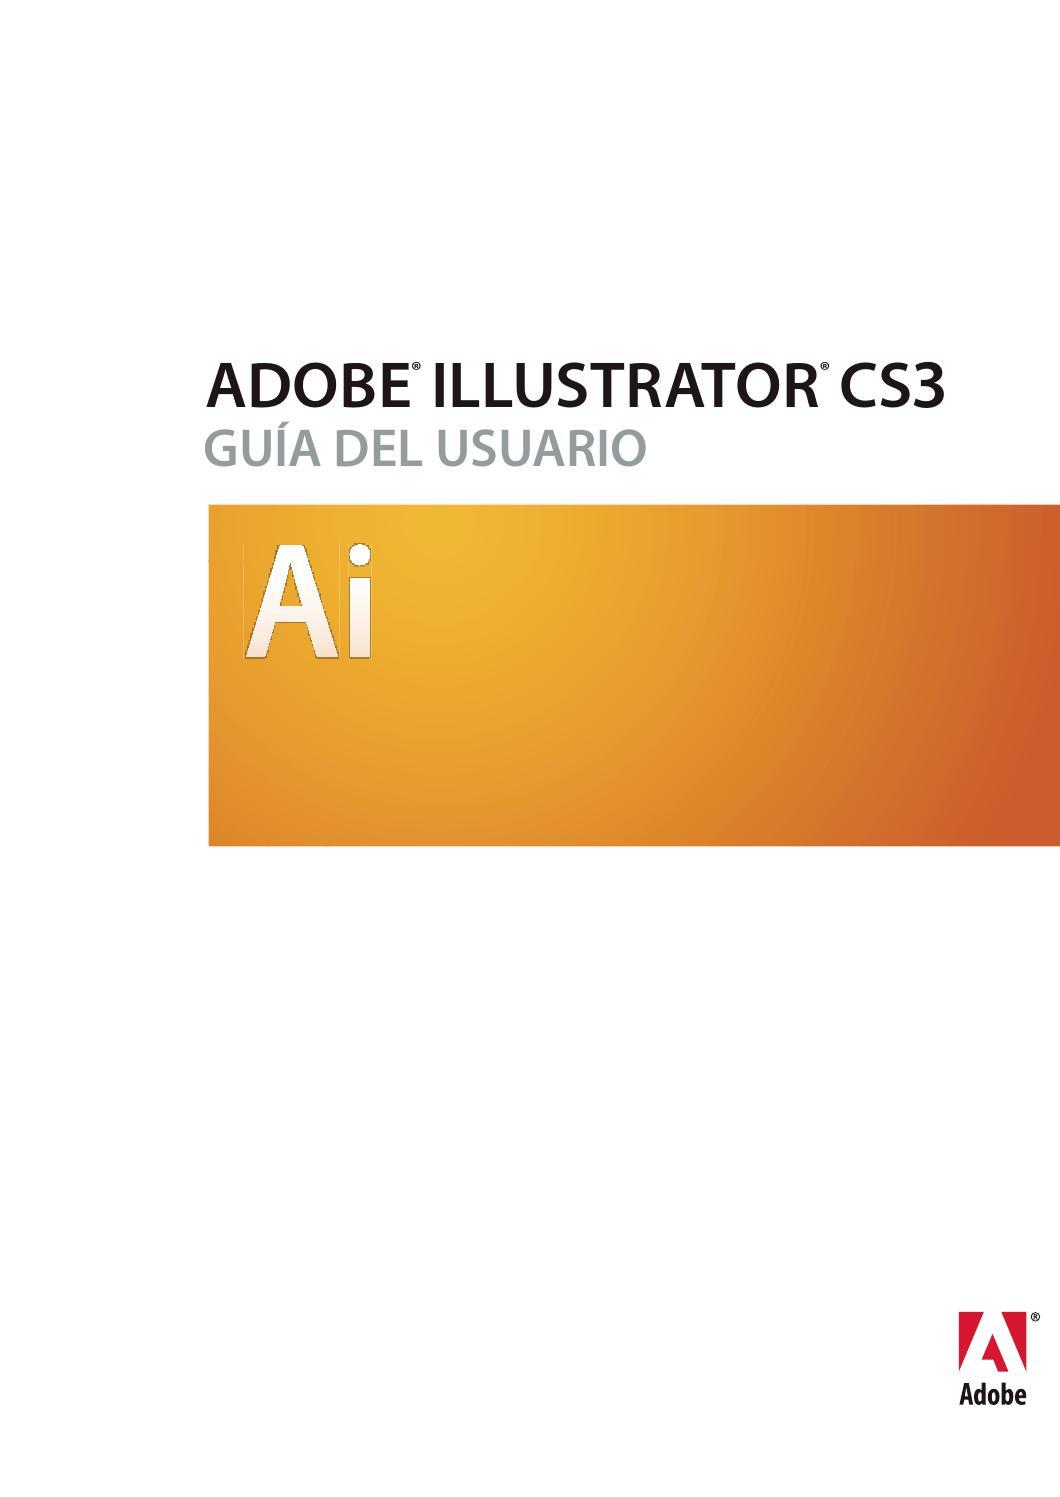 Manual adobe illustrator cs3 by paco.martin.educarex - issuu